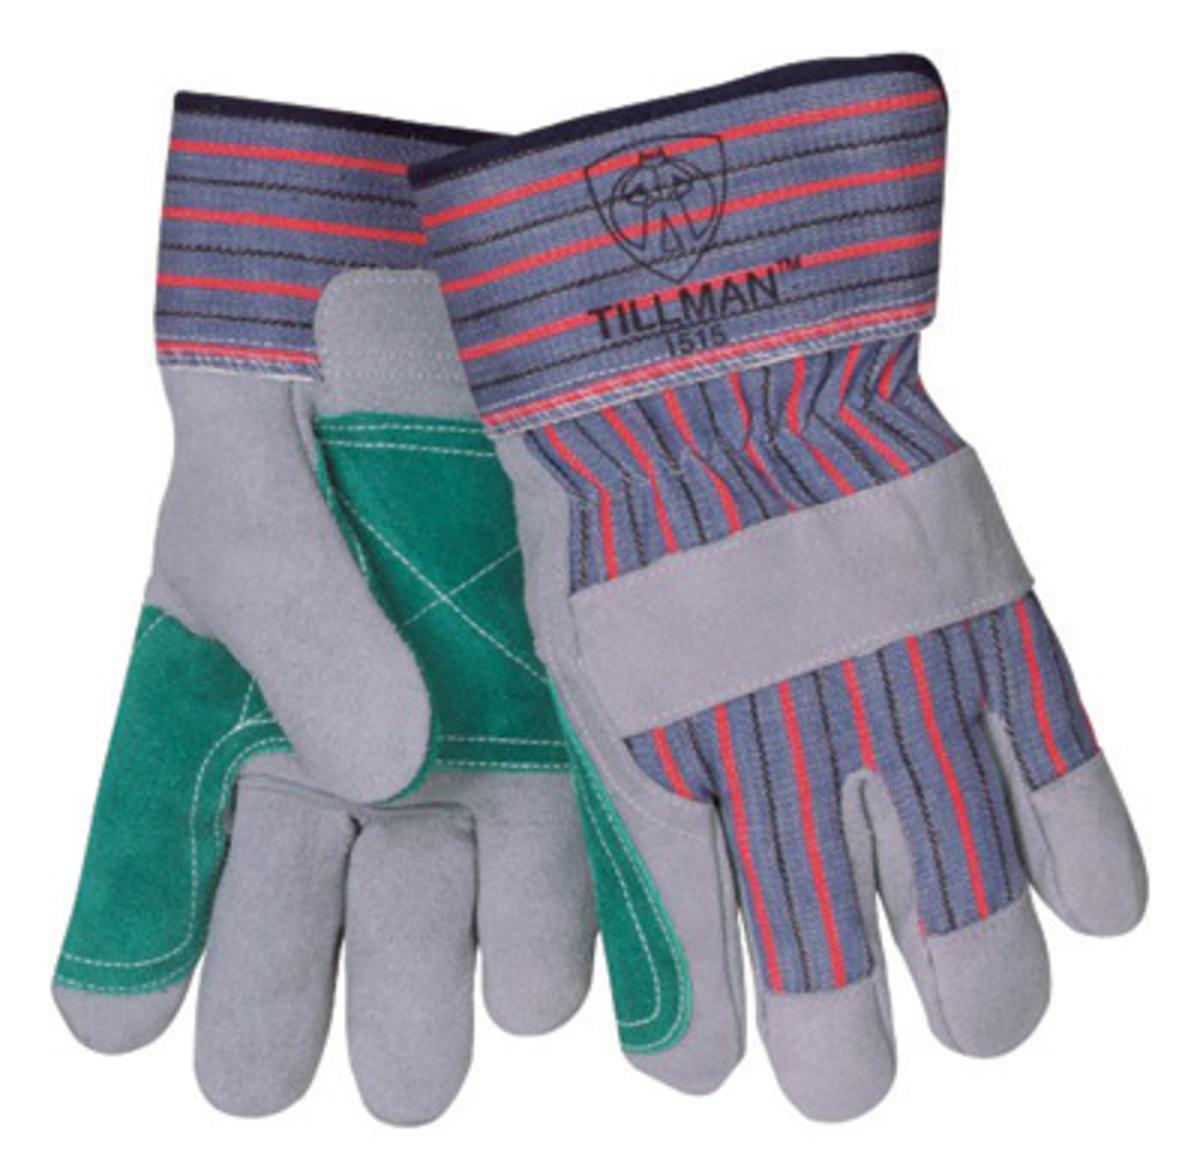 Gauntlet cuff leather work gloves - Tillman Large Standard Grade Shoulder Split Cowhide Leather Palm Glove With 2 1 2